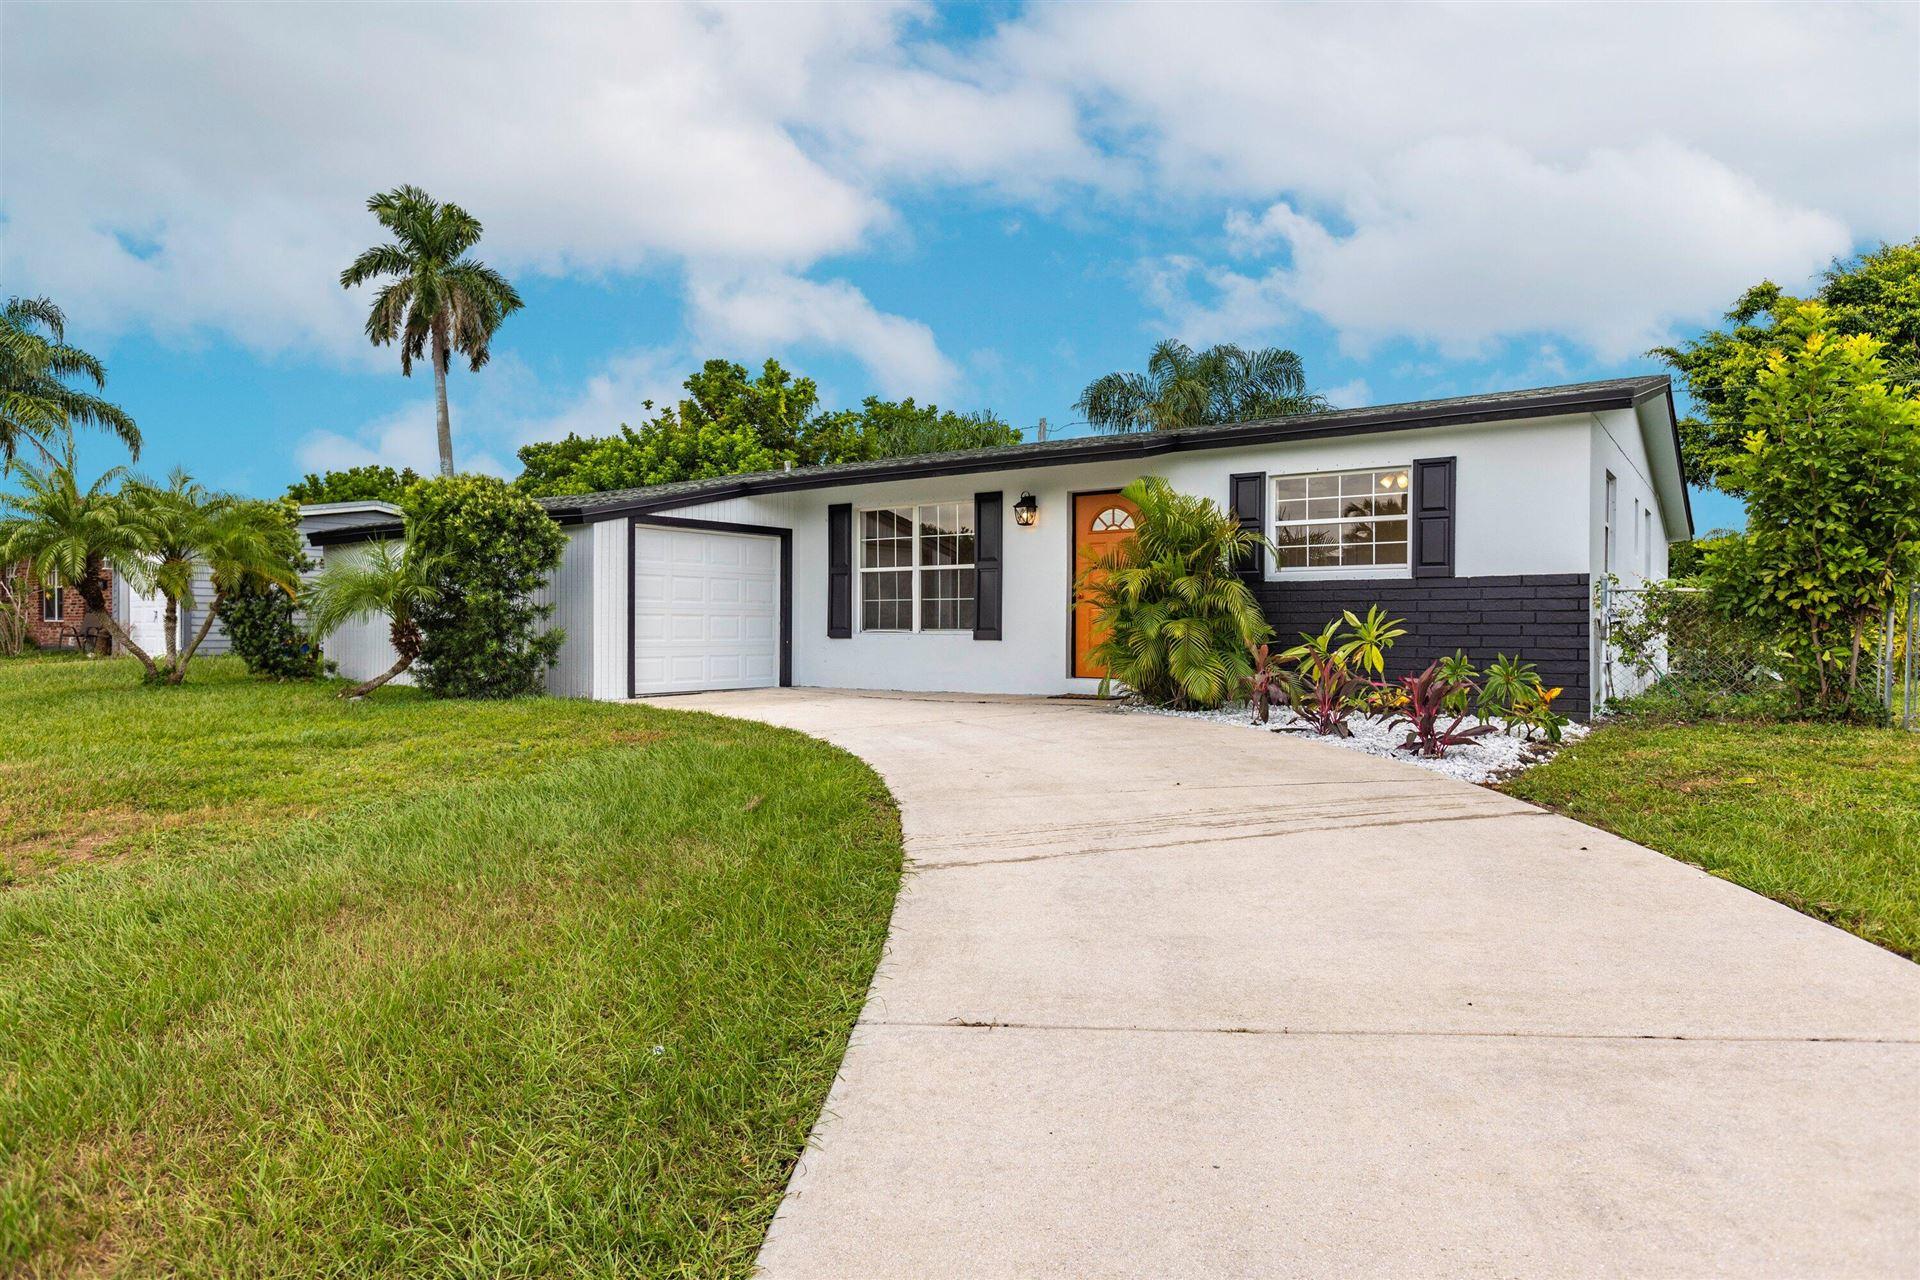 Photo of 12149 Colony Avenue, Palm Beach Gardens, FL 33410 (MLS # RX-10743281)